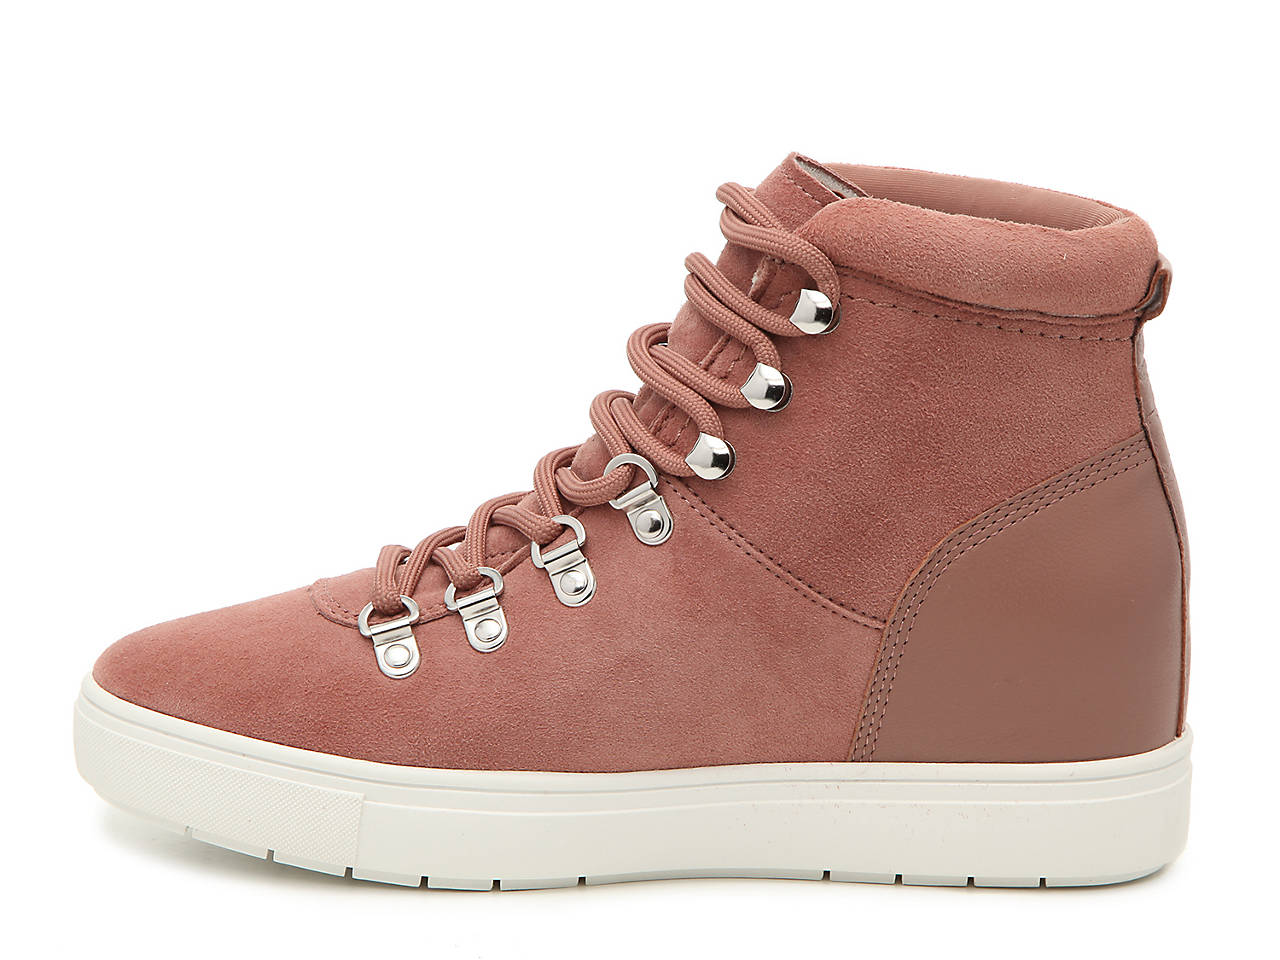 d5816e00b40 Steven by Steve Madden Kalea Wedge High-Top Sneaker Men s Shoes